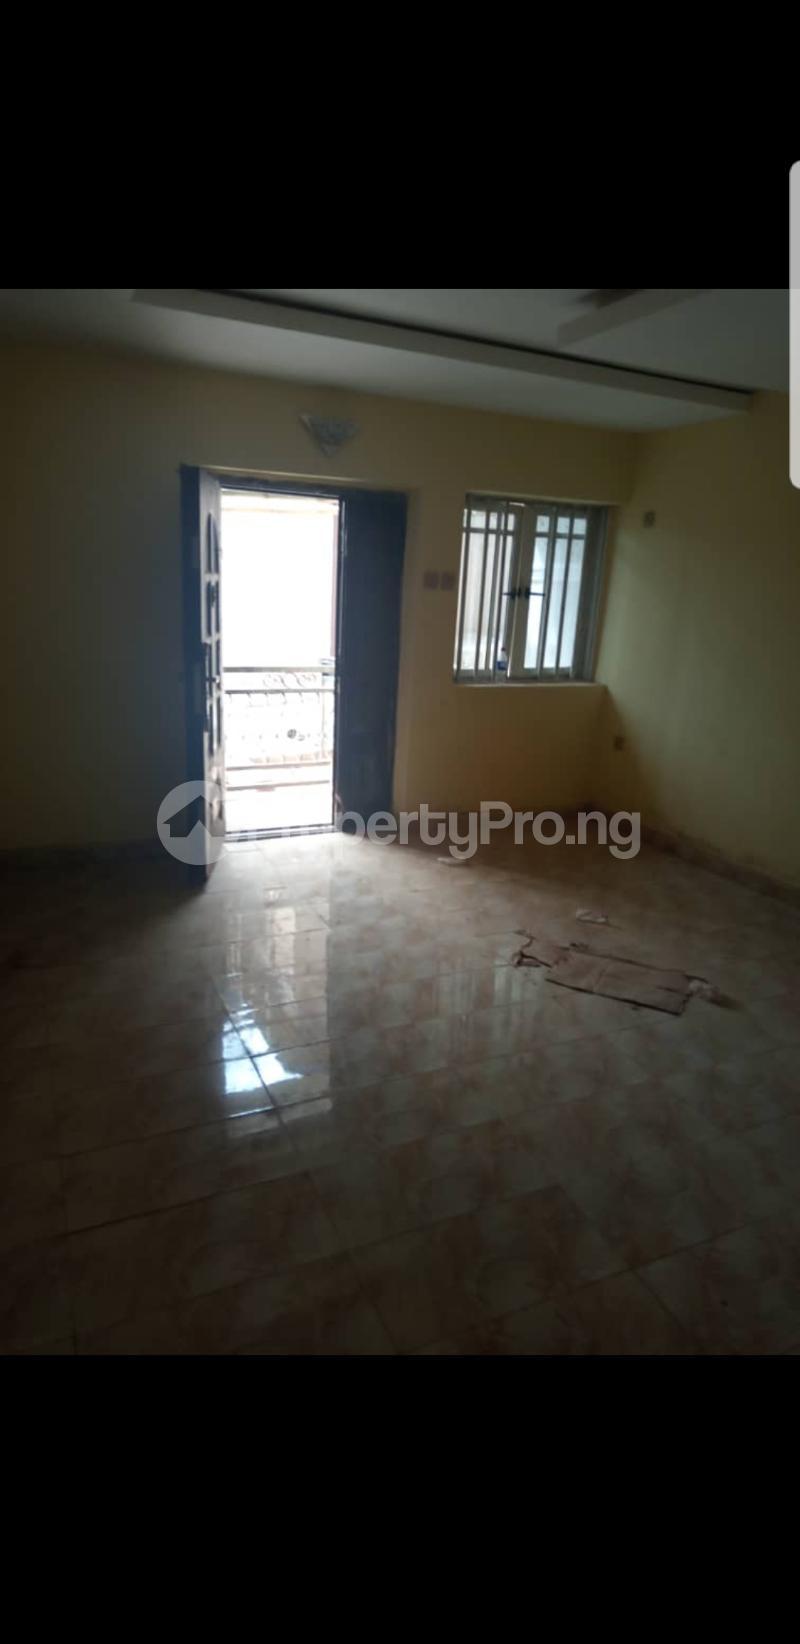 3 bedroom Shared Apartment Flat / Apartment for rent Enugu Enugu - 6